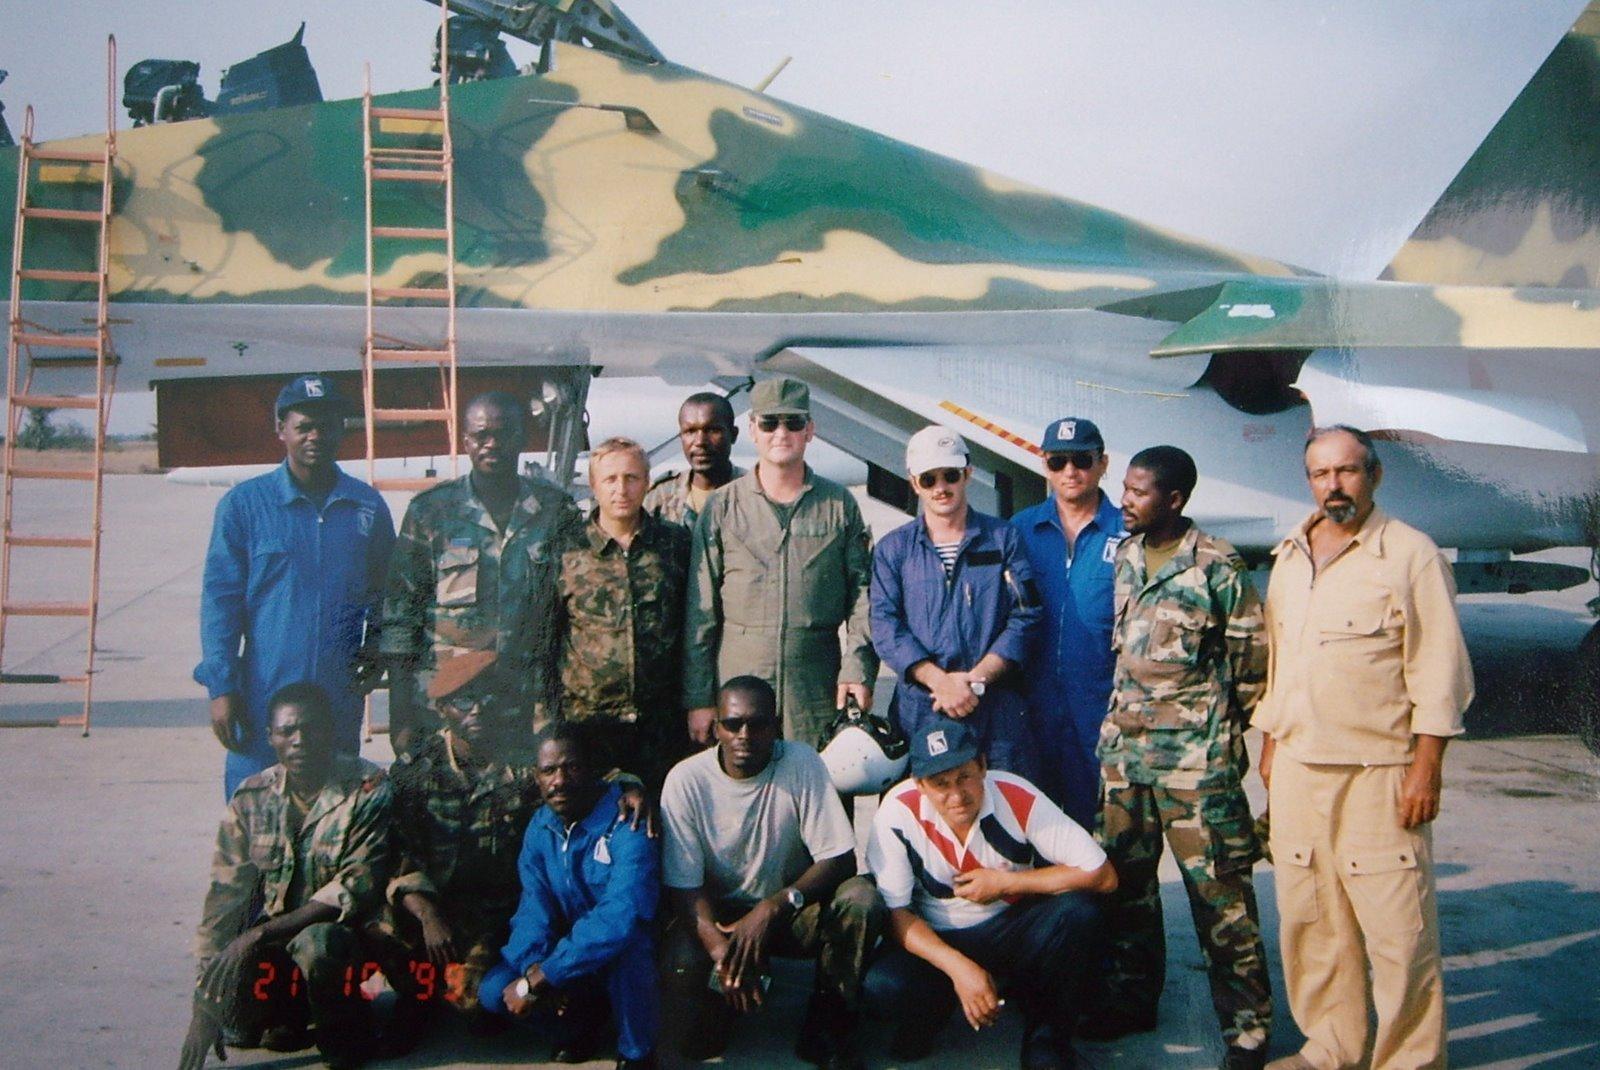 Armée Angolaise/Angolan Armed Forces SU-27%2BANGOLA%2B3